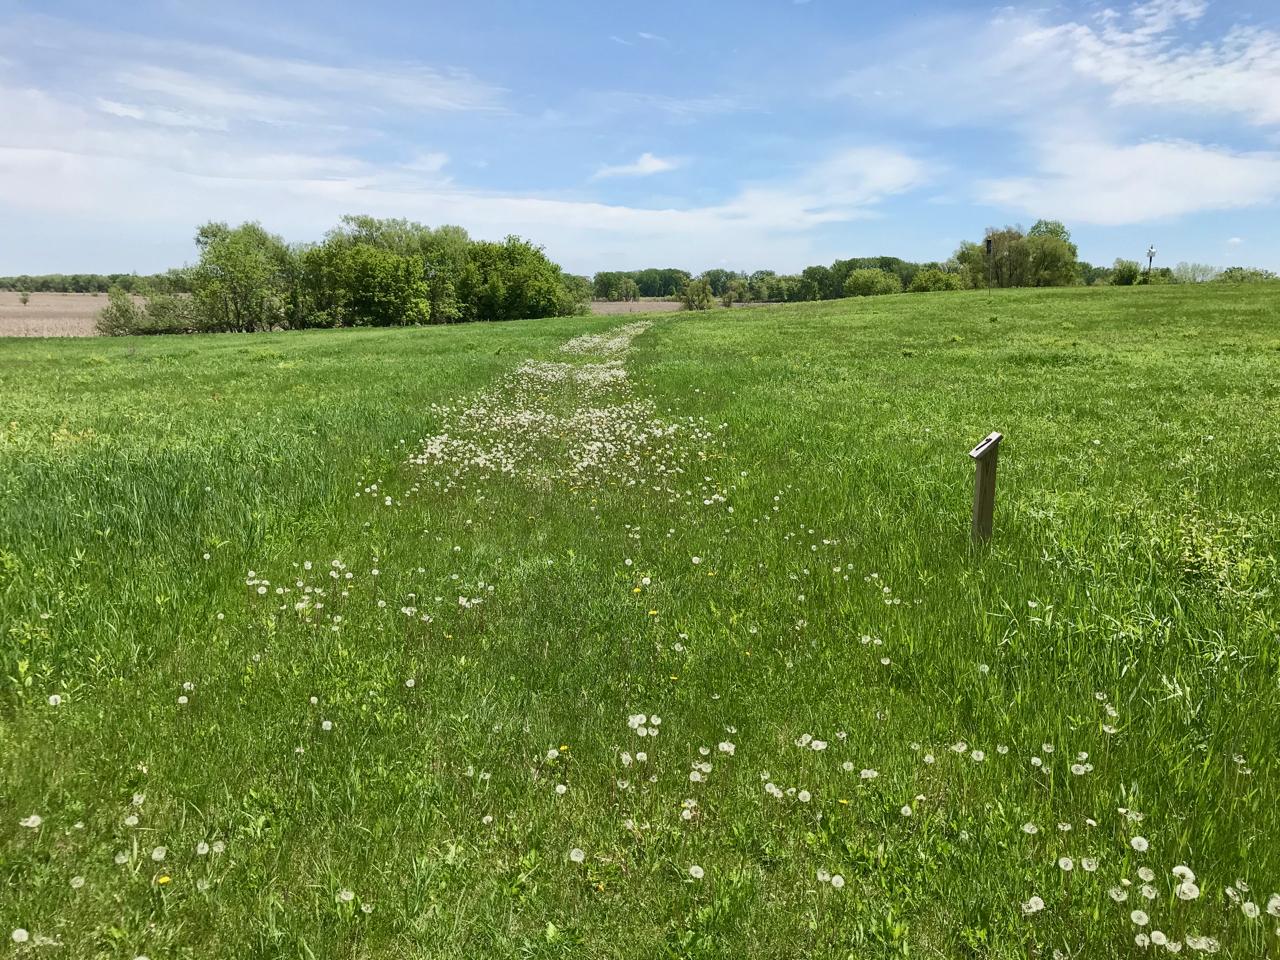 Dandelion Road Two. Lake Farm Park. Madison, Wisconsin. May 2018. © William D. Walker